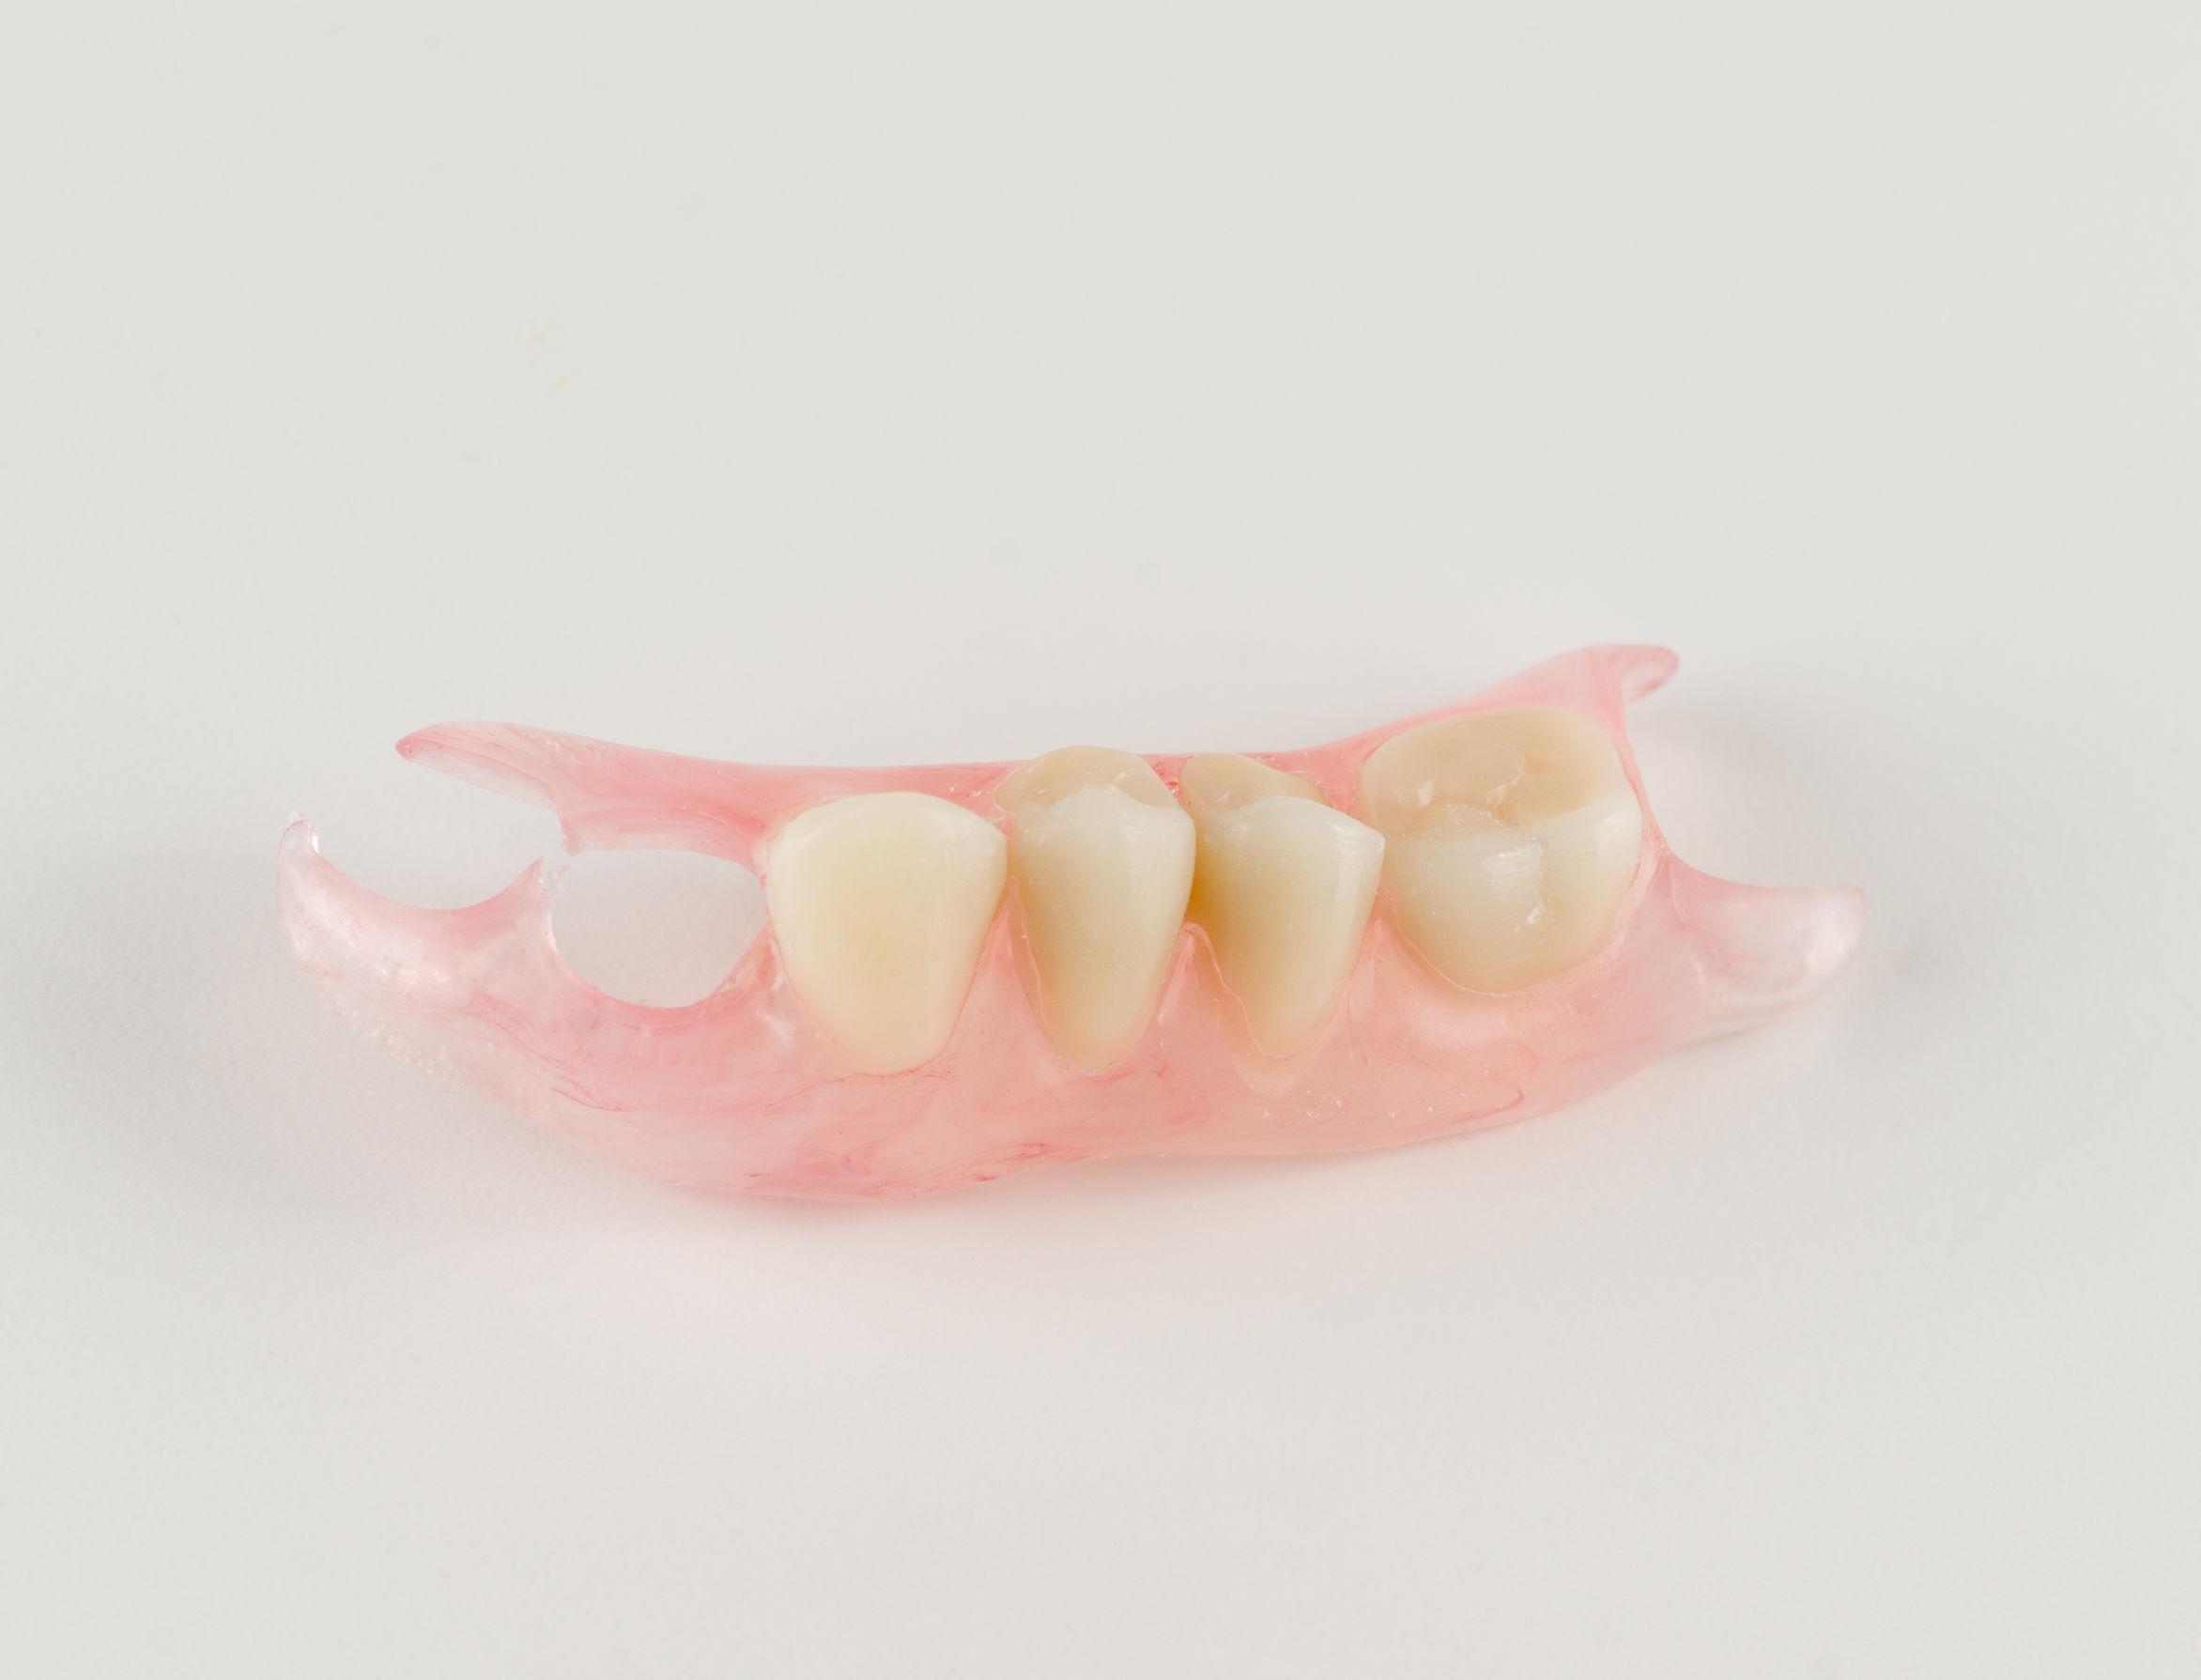 Valplast 4 Dents